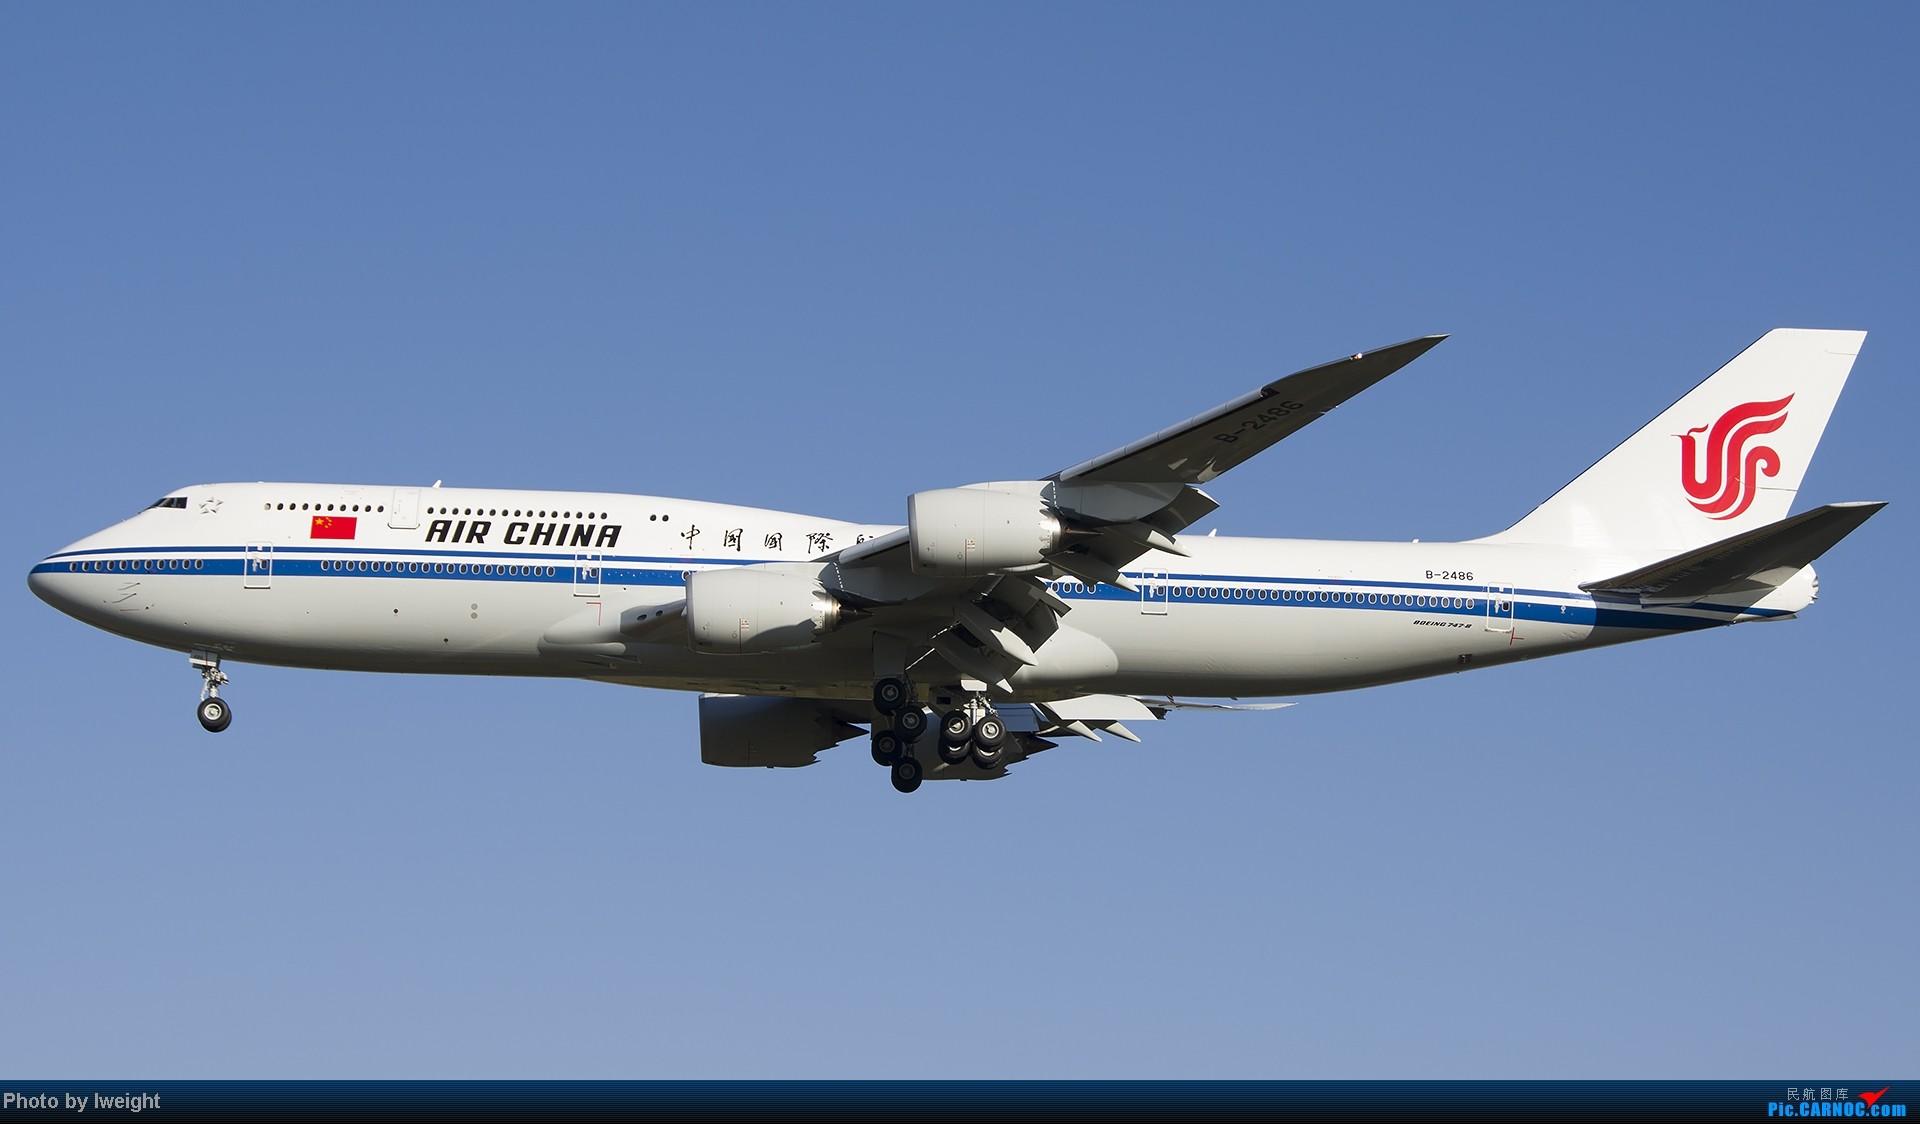 Re:[原创]抓住APEC蓝的尾巴,再拍上一组 BOEING 747-8I B-2486 中国北京首都机场